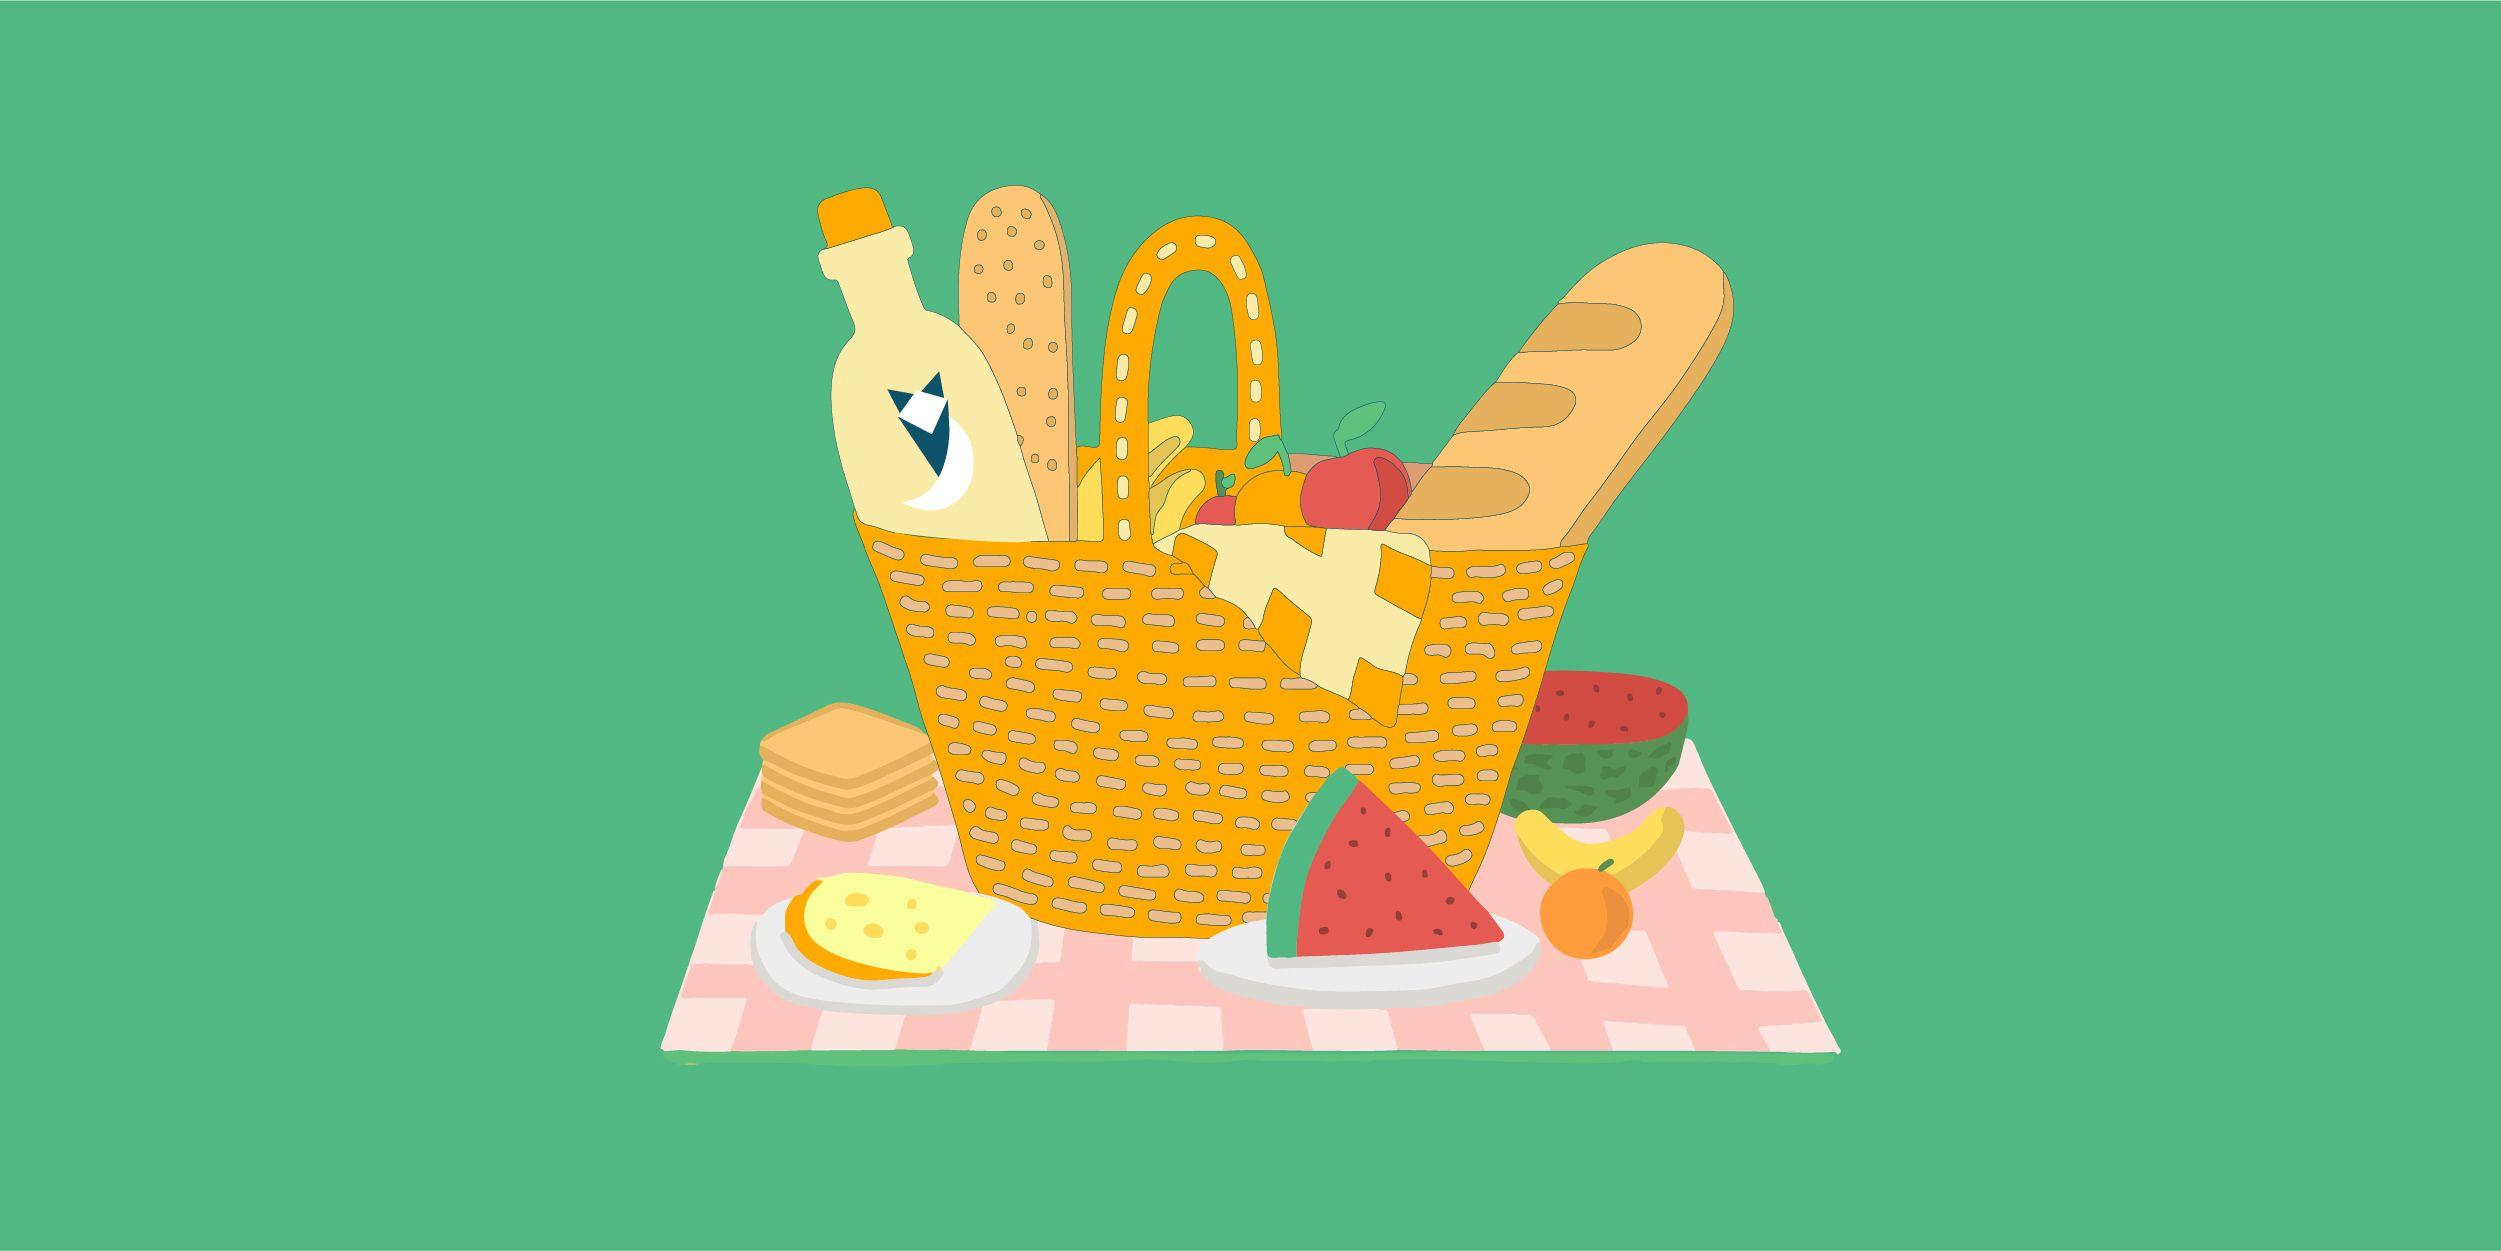 افكار موفرة للـ Picnic في إفطار رمضان 2021